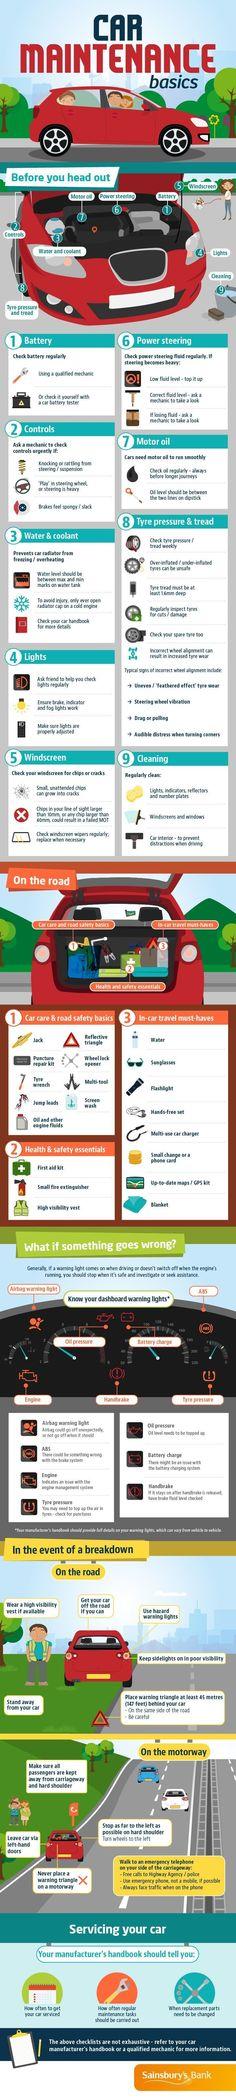 A Visual Guide to Car Maintenance #TeachingTuesday #Cars #Transportation